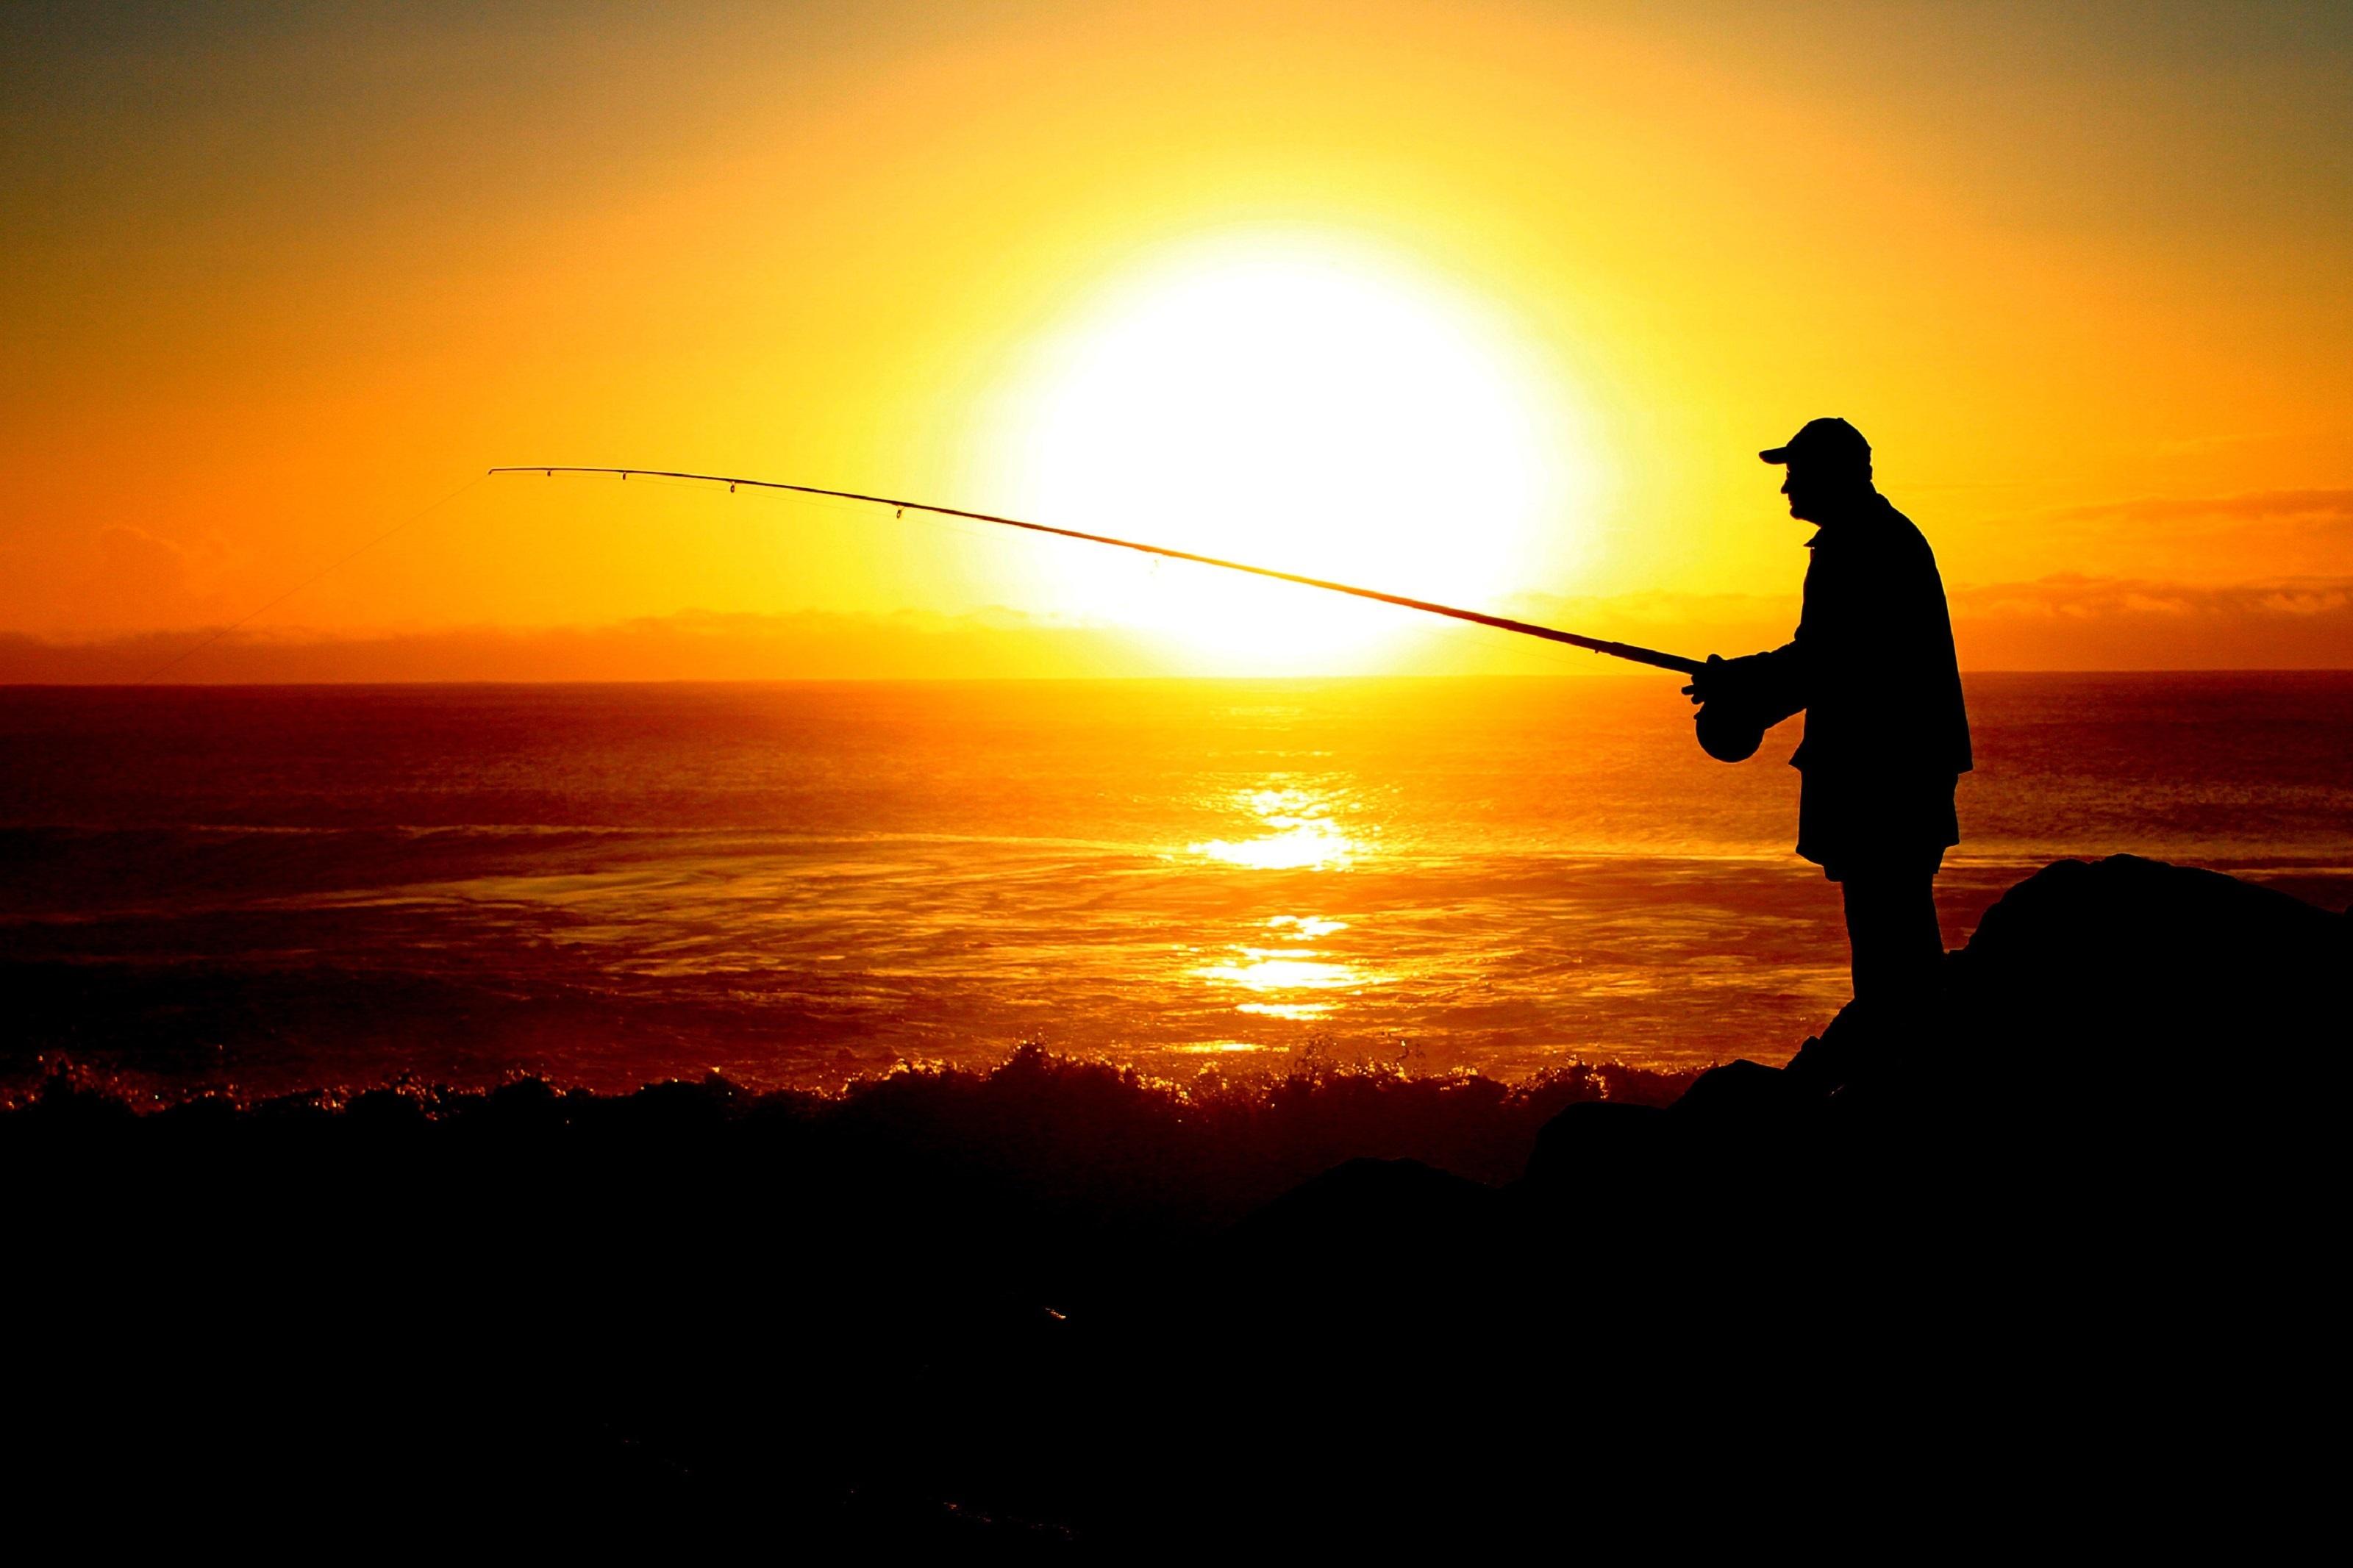 русская рыбалка на телефон